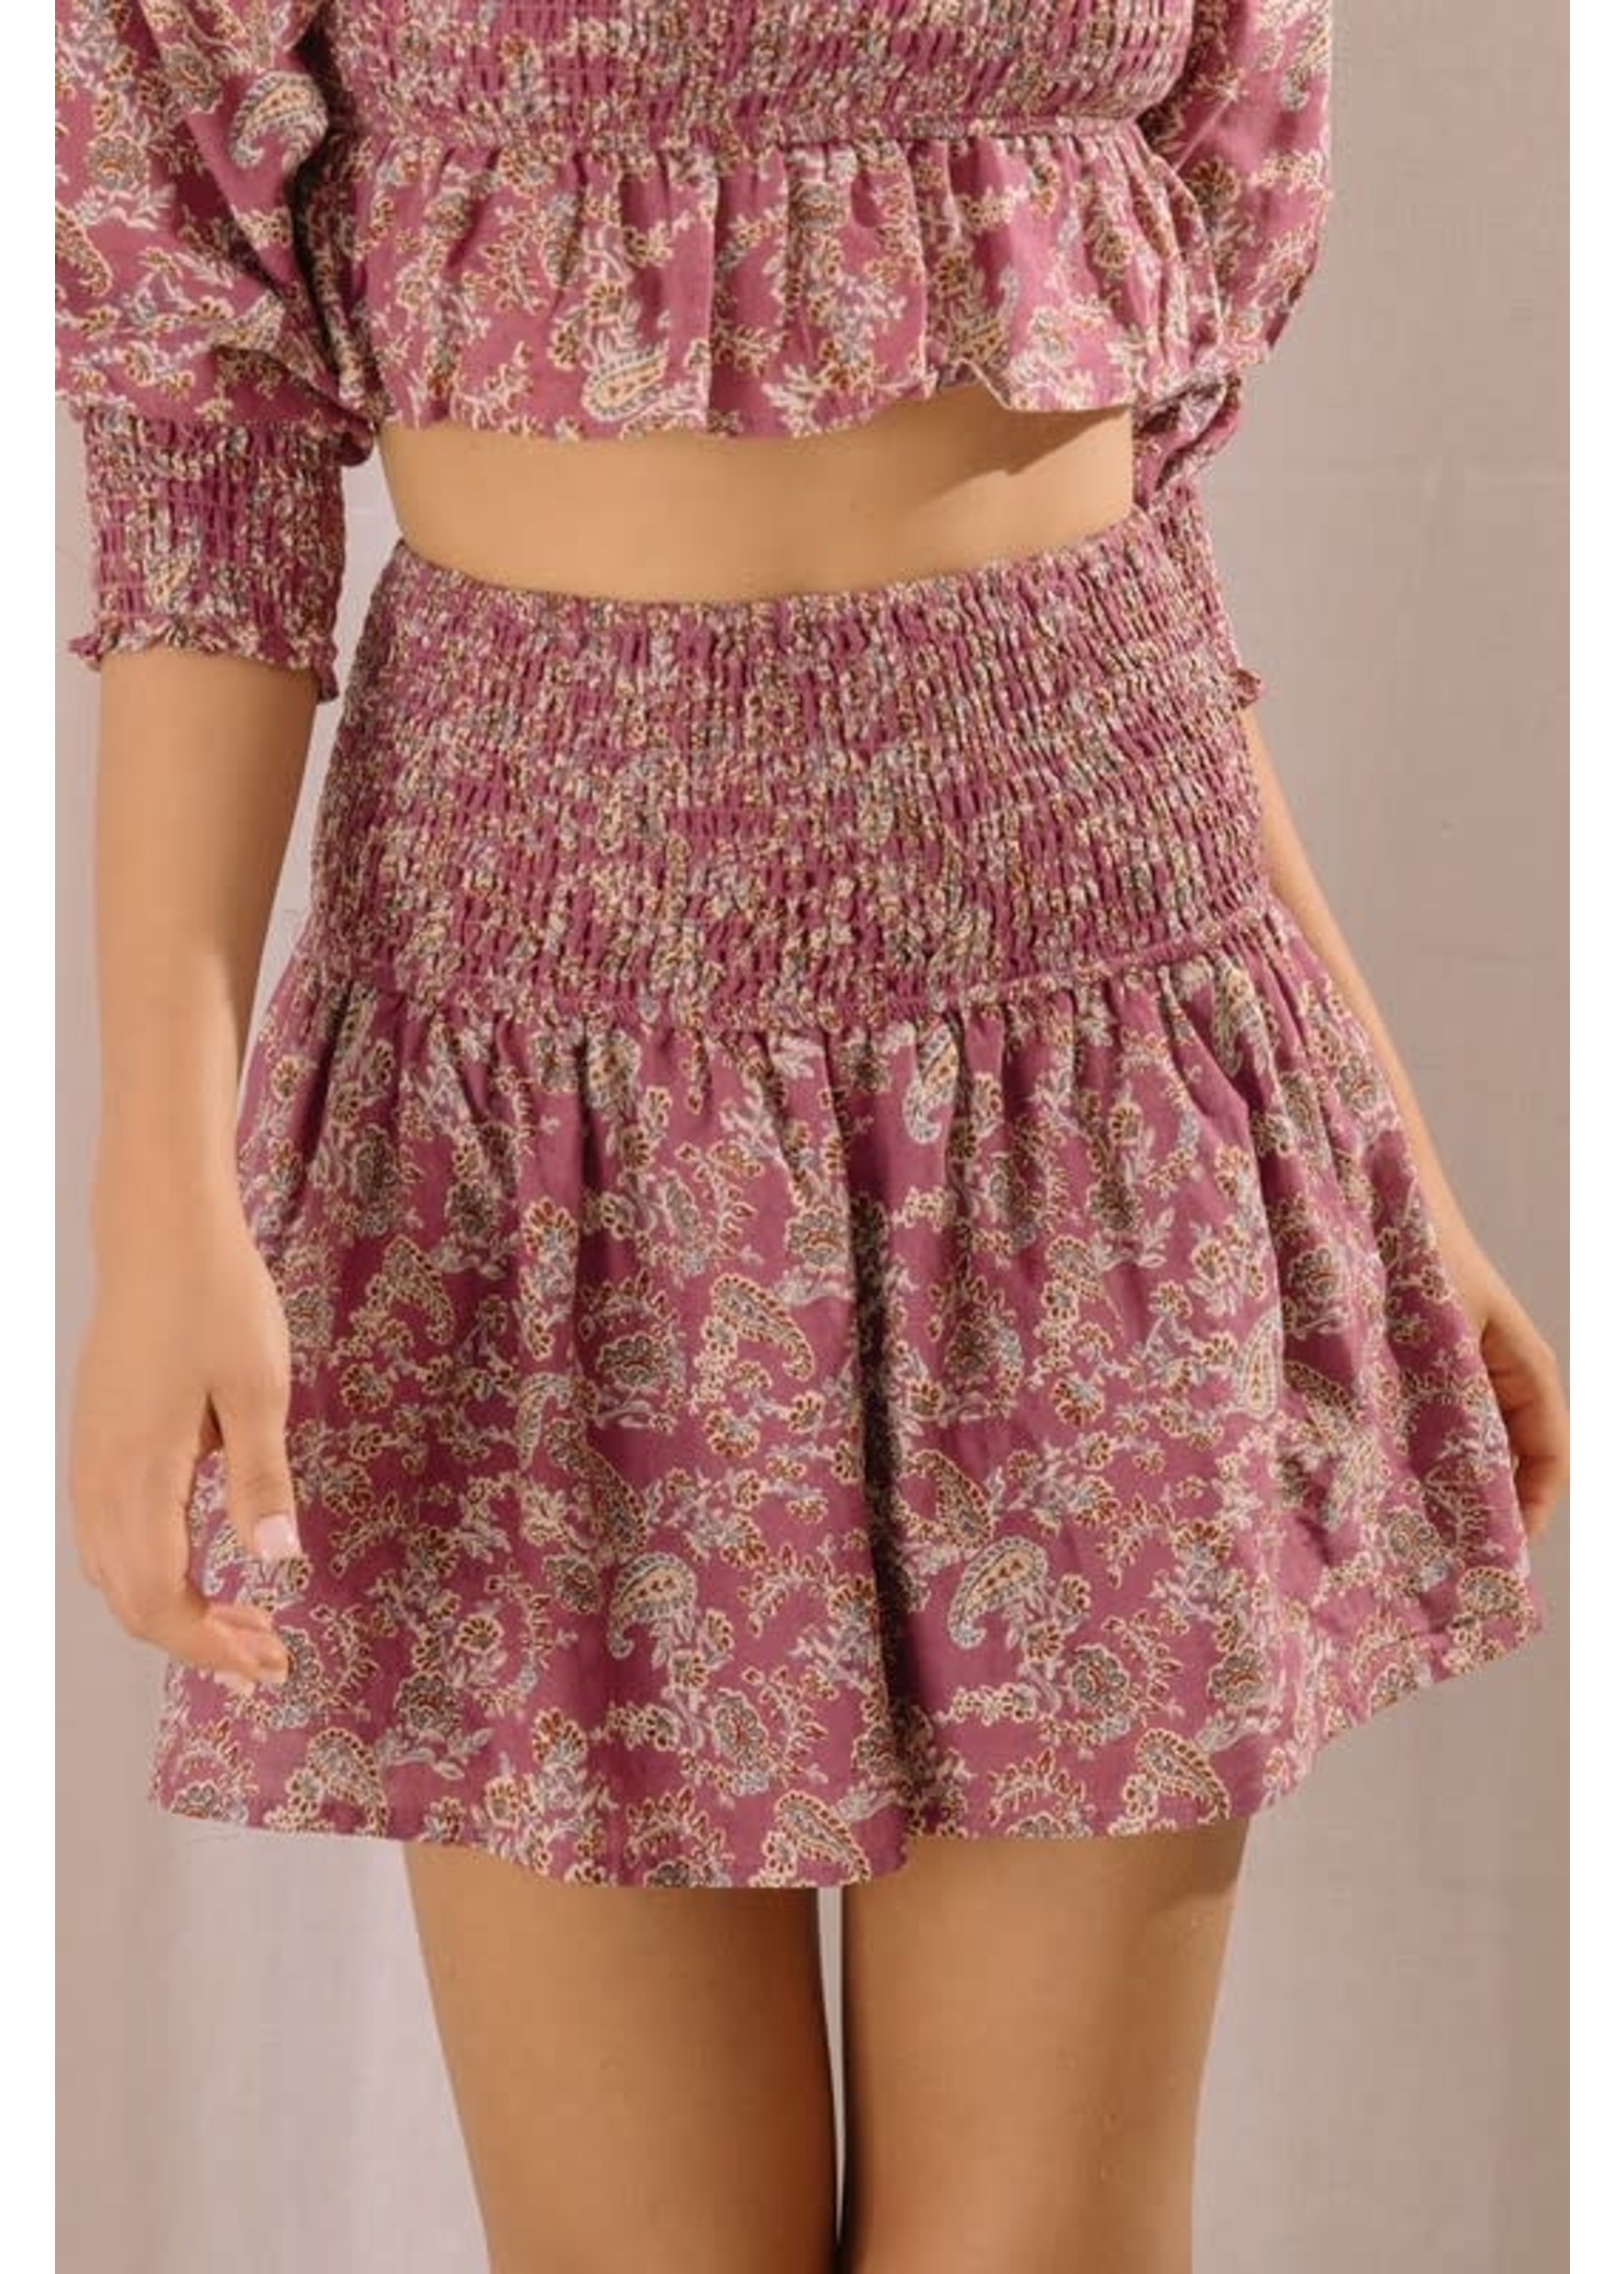 Storia Paisley Smocked Mini Skirt - JS3467